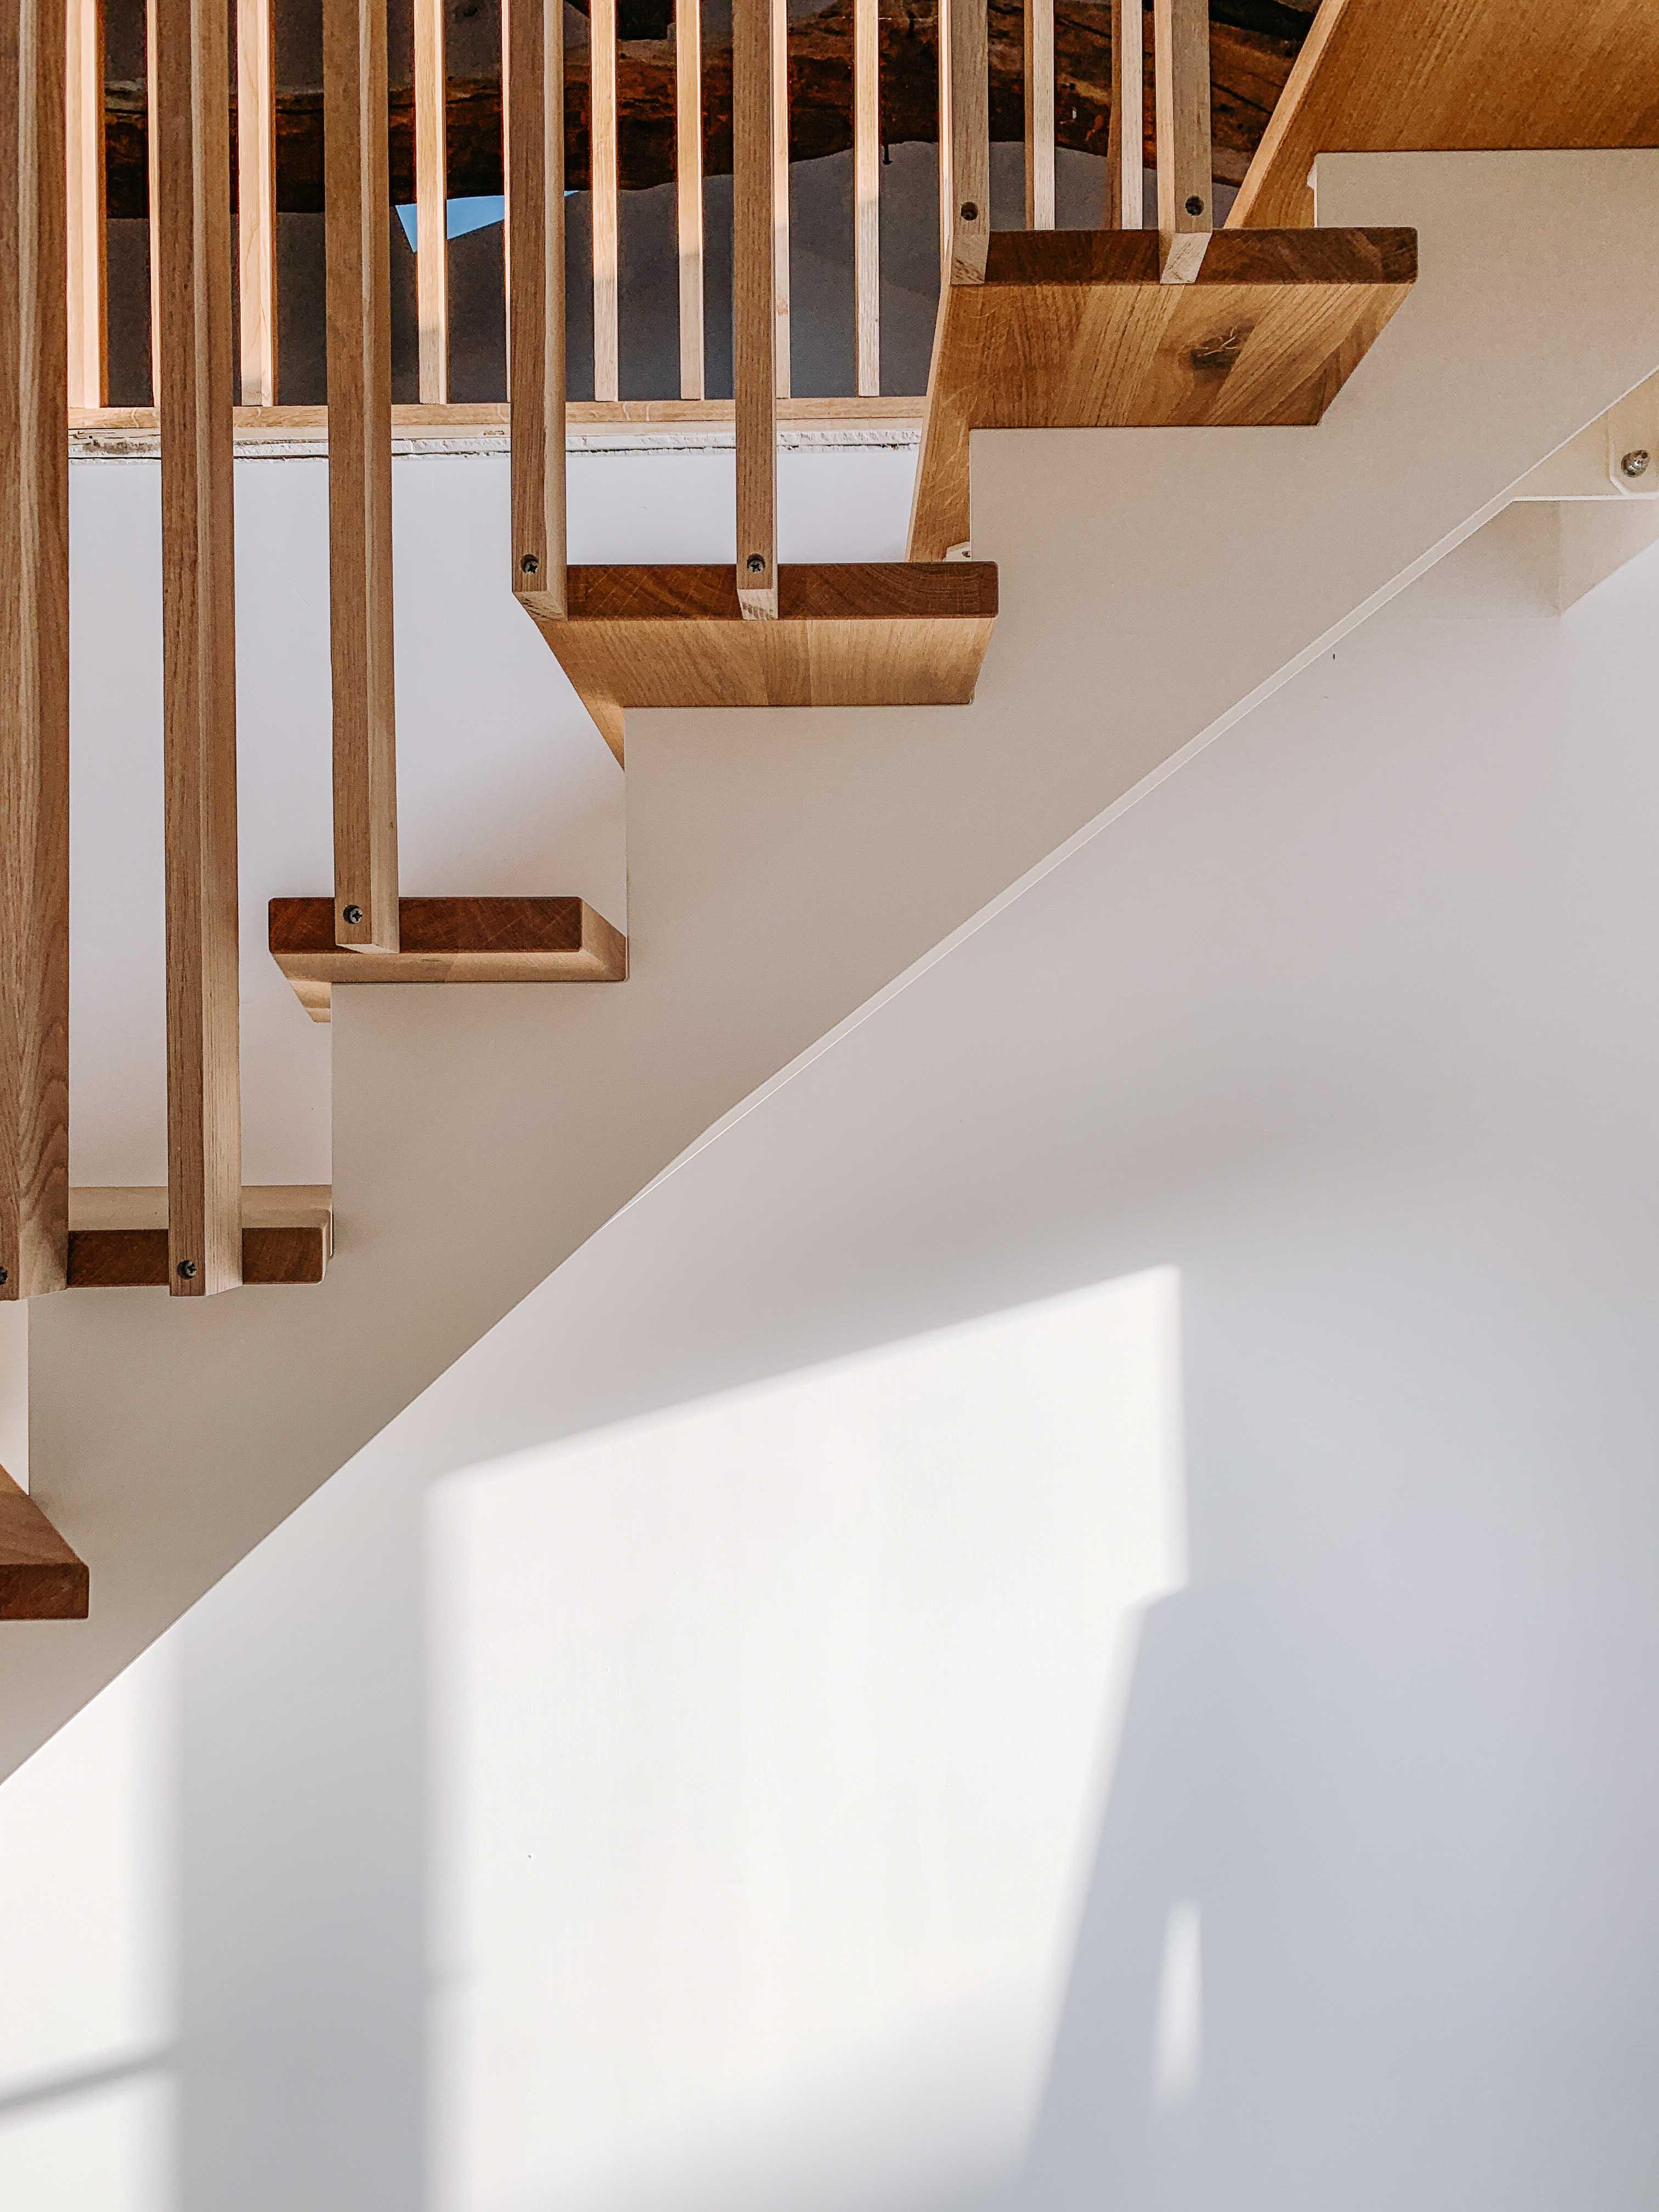 architecte-lyon-rénovation-presbytere-marcilly-azergues-pierre-dorée-43